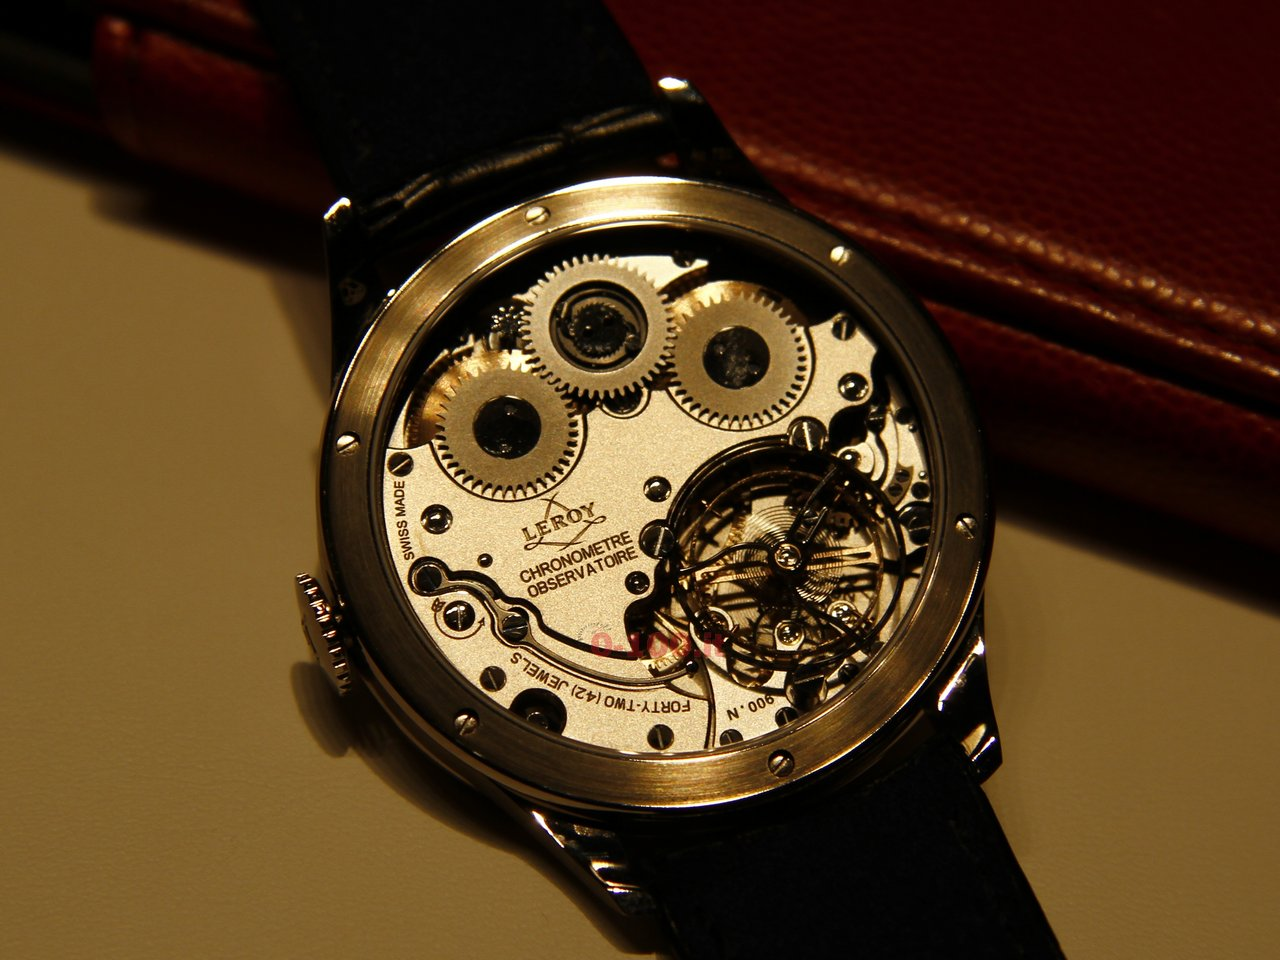 baselworld-2015_leroy-chronometer-l200-0-100-14